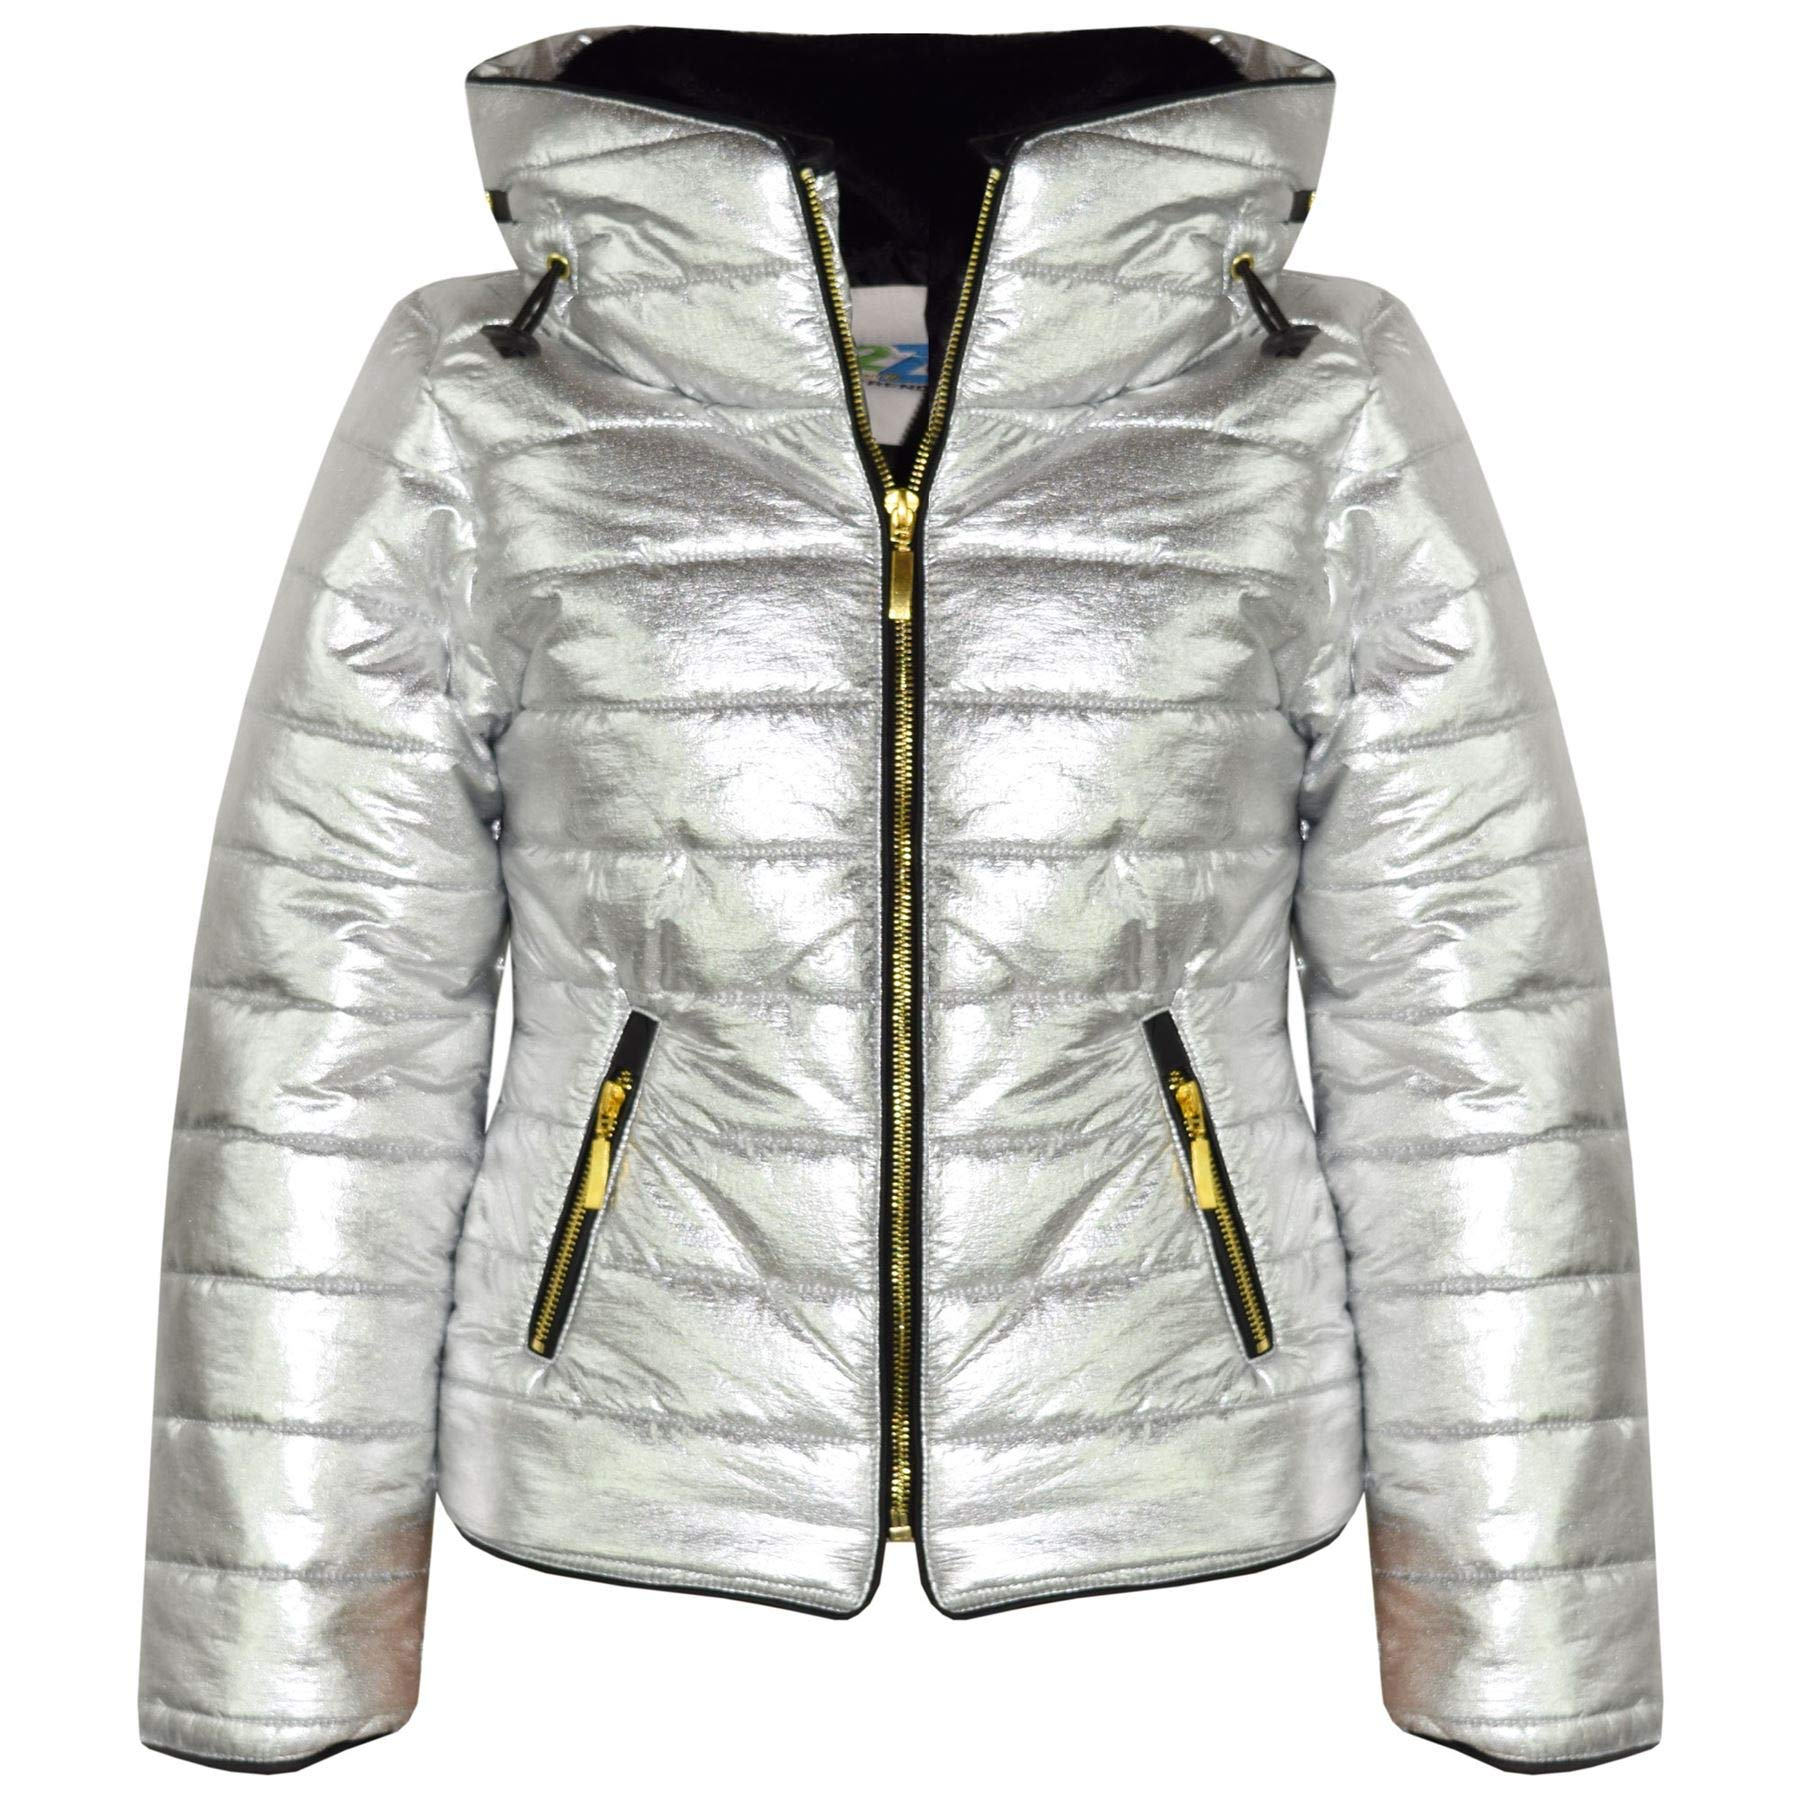 bd0da99fd11d A2Z 4 Kids® Girls Jacket Kids Stylish Padded Puffer Bubble Faux Fur ...